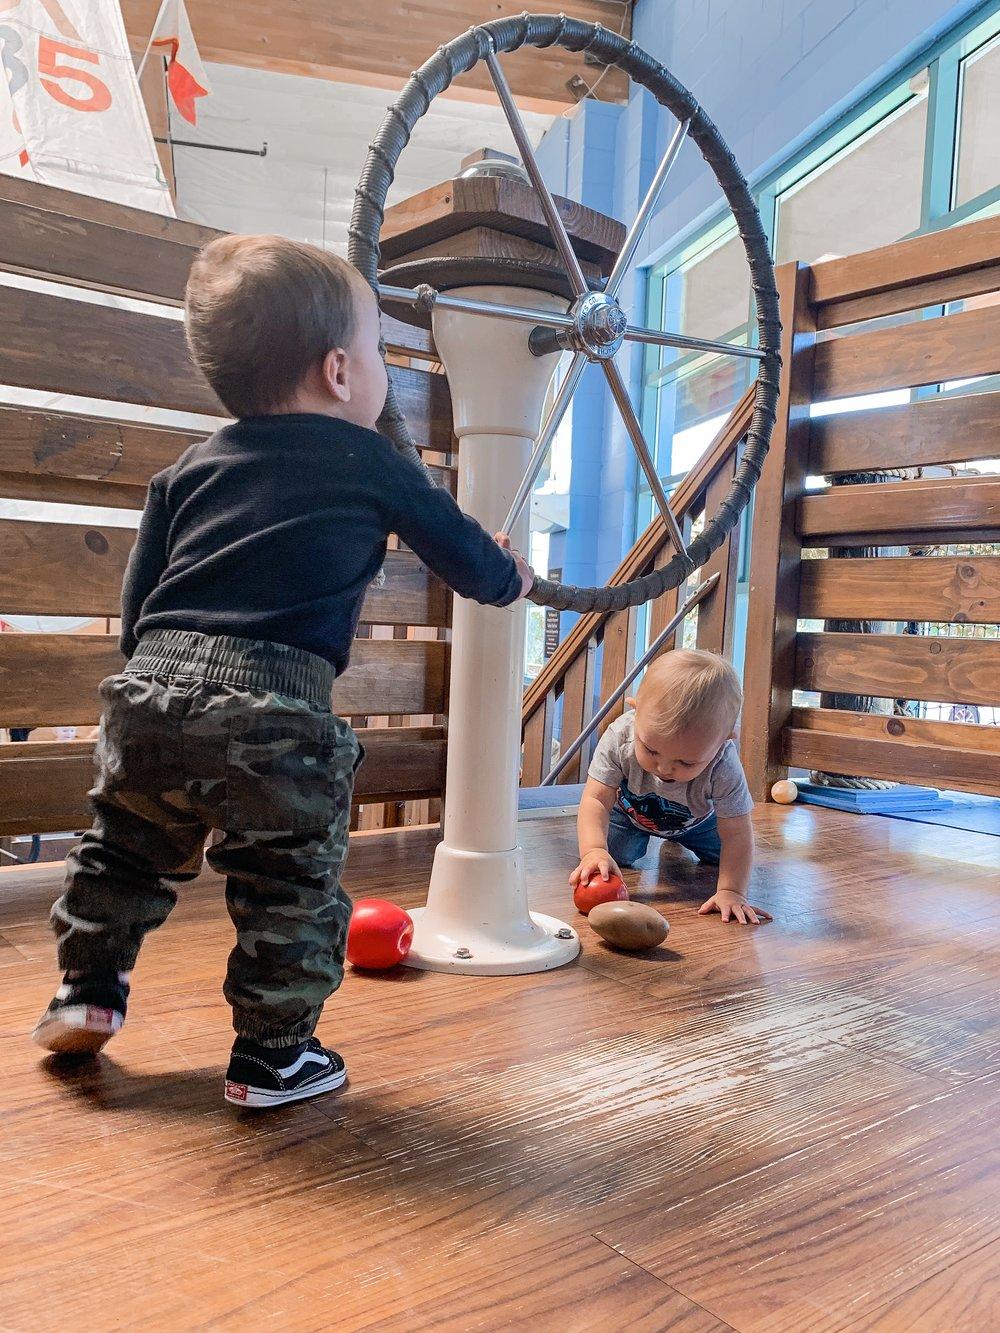 San Diego Children's Discovery Museum- a recap